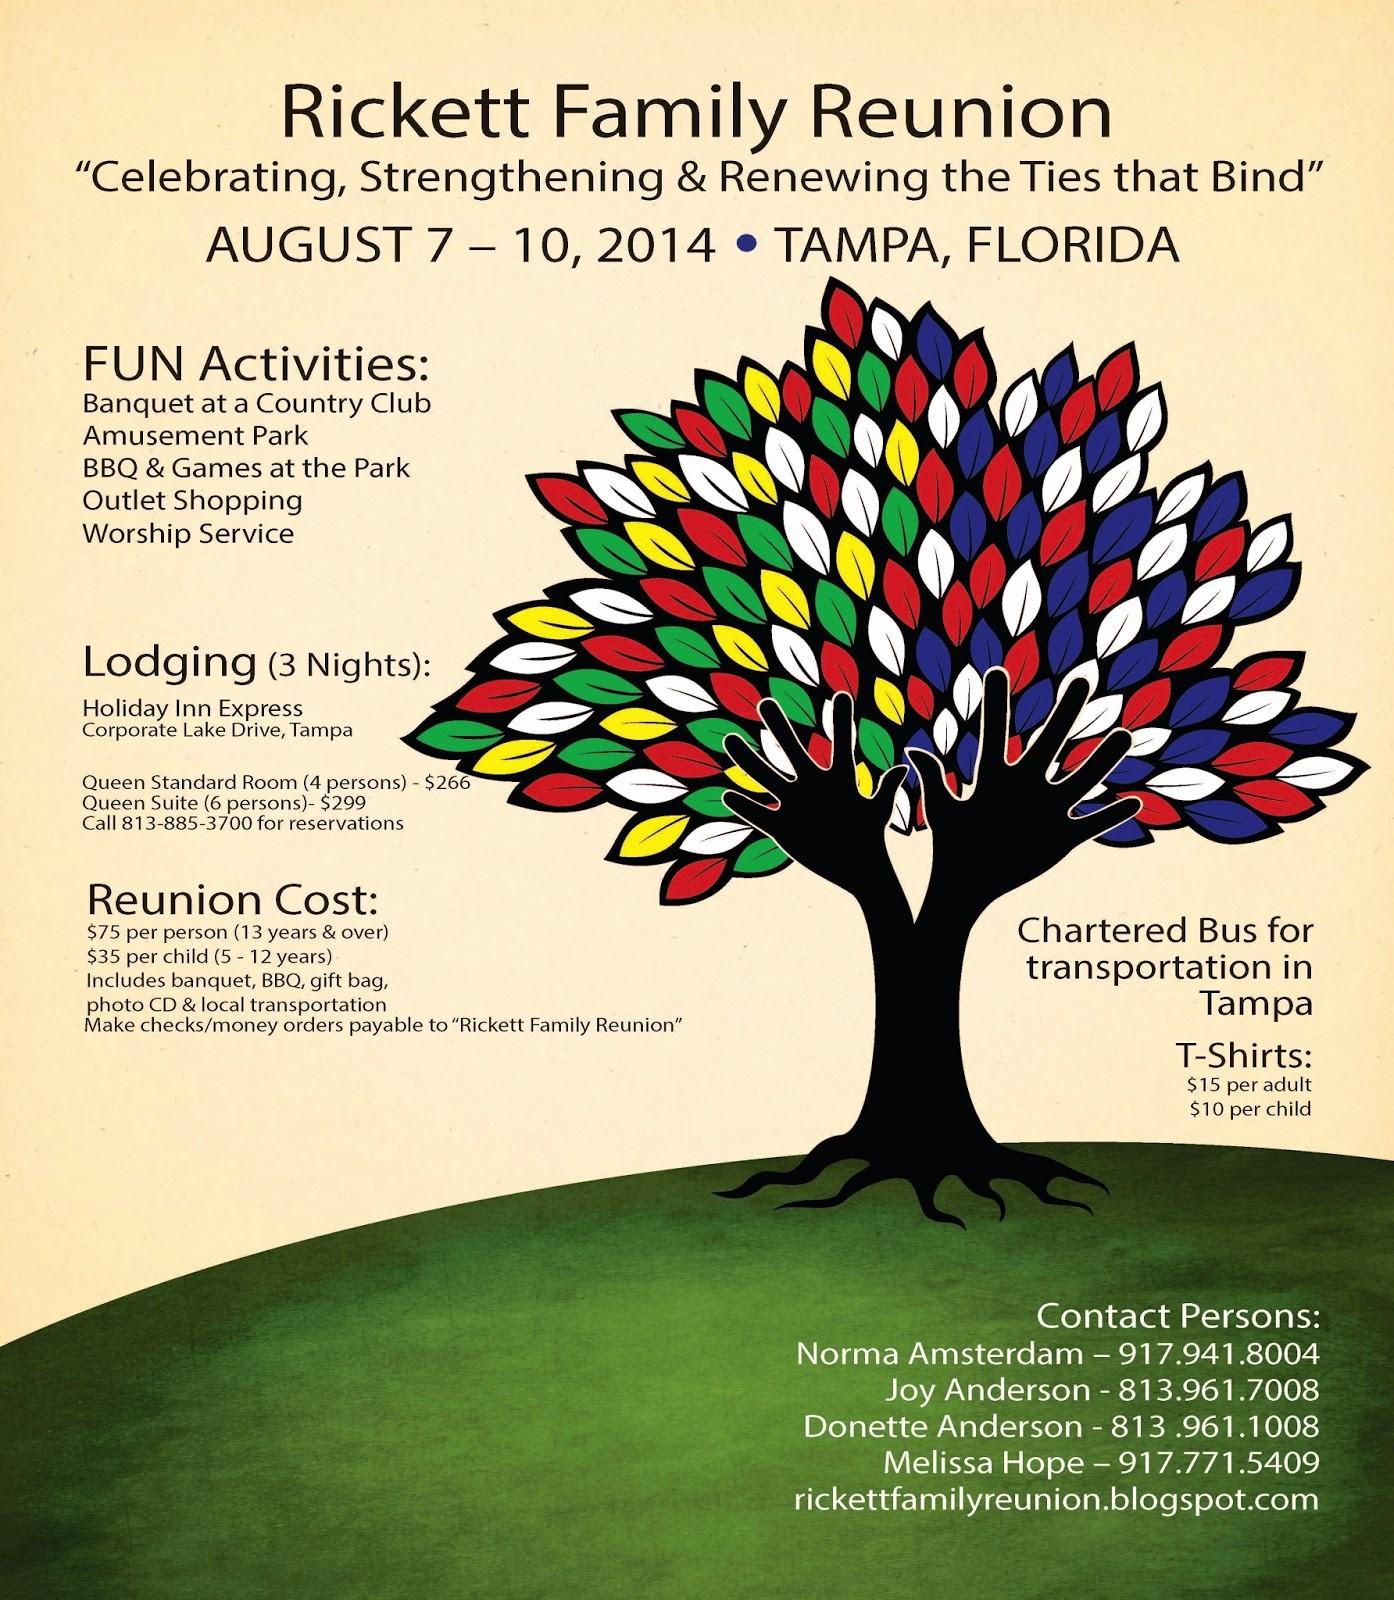 Free Family Reunion Flyer Template Fresh Rickett Family Reunion Blog